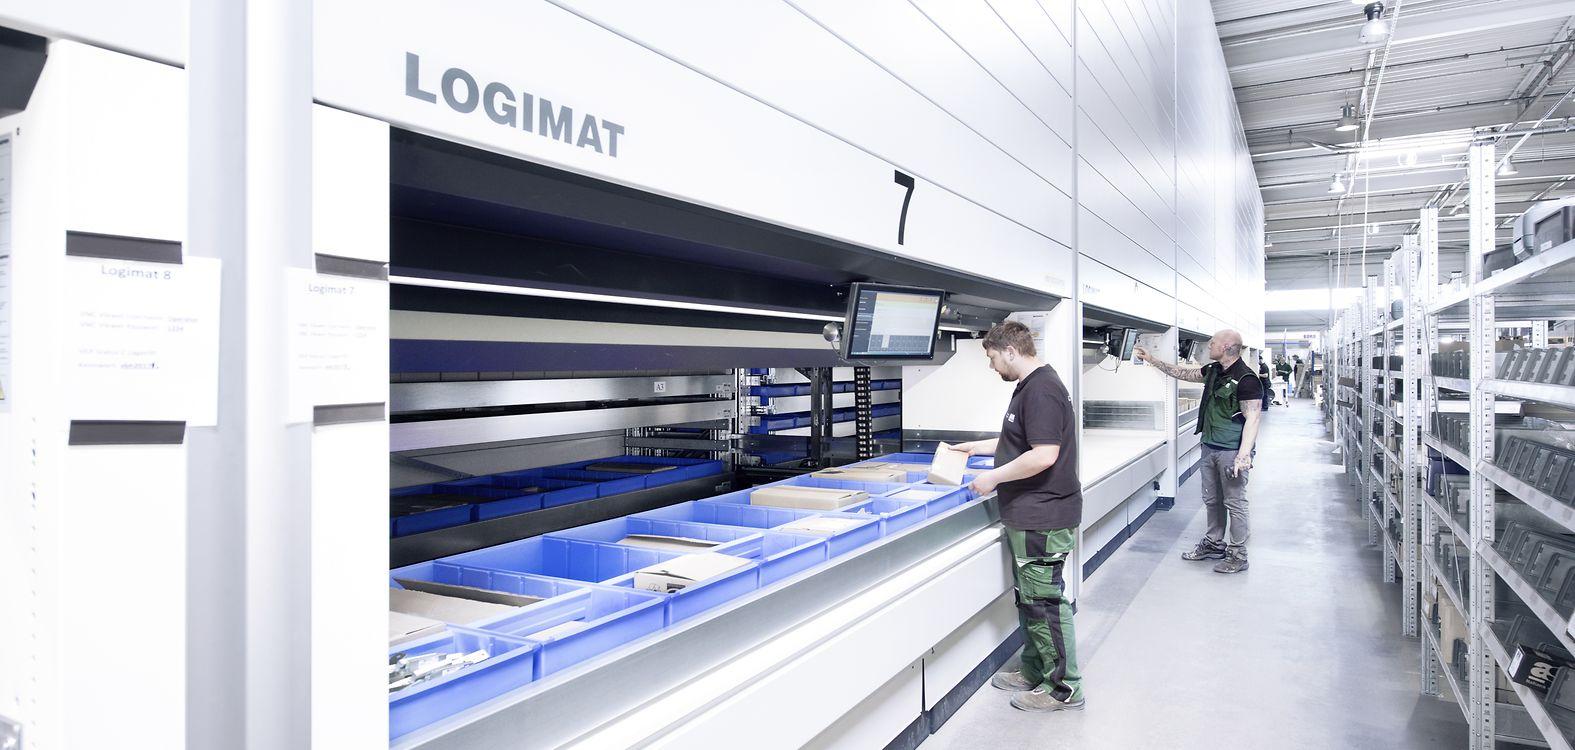 vertical-storage-lift-logimat---dam-image-cs-804-